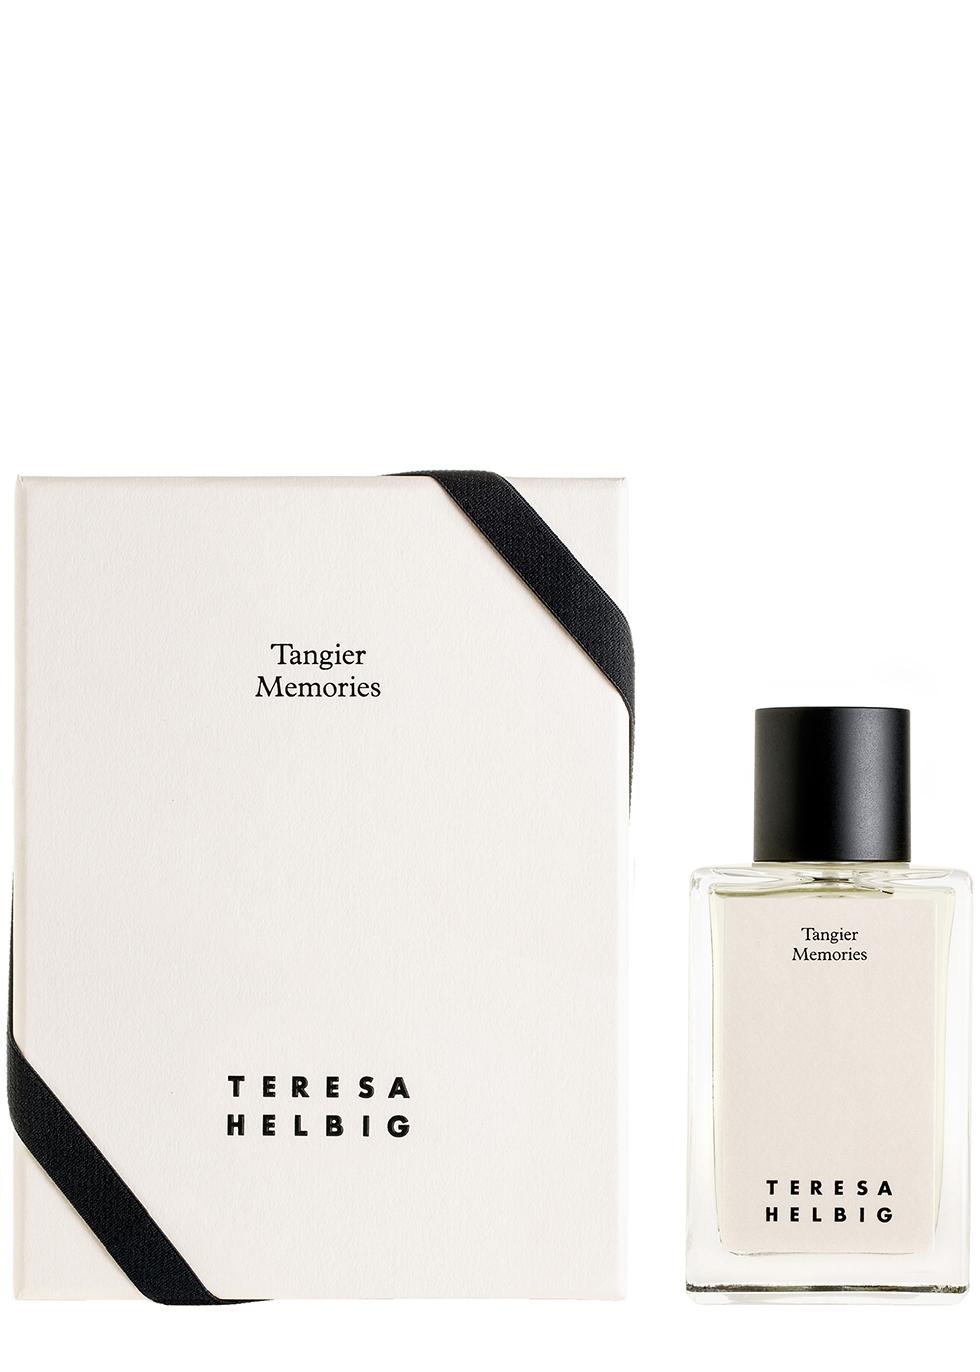 Tangier Memories Eau De Parfum 100ml - TERESA HELBIG